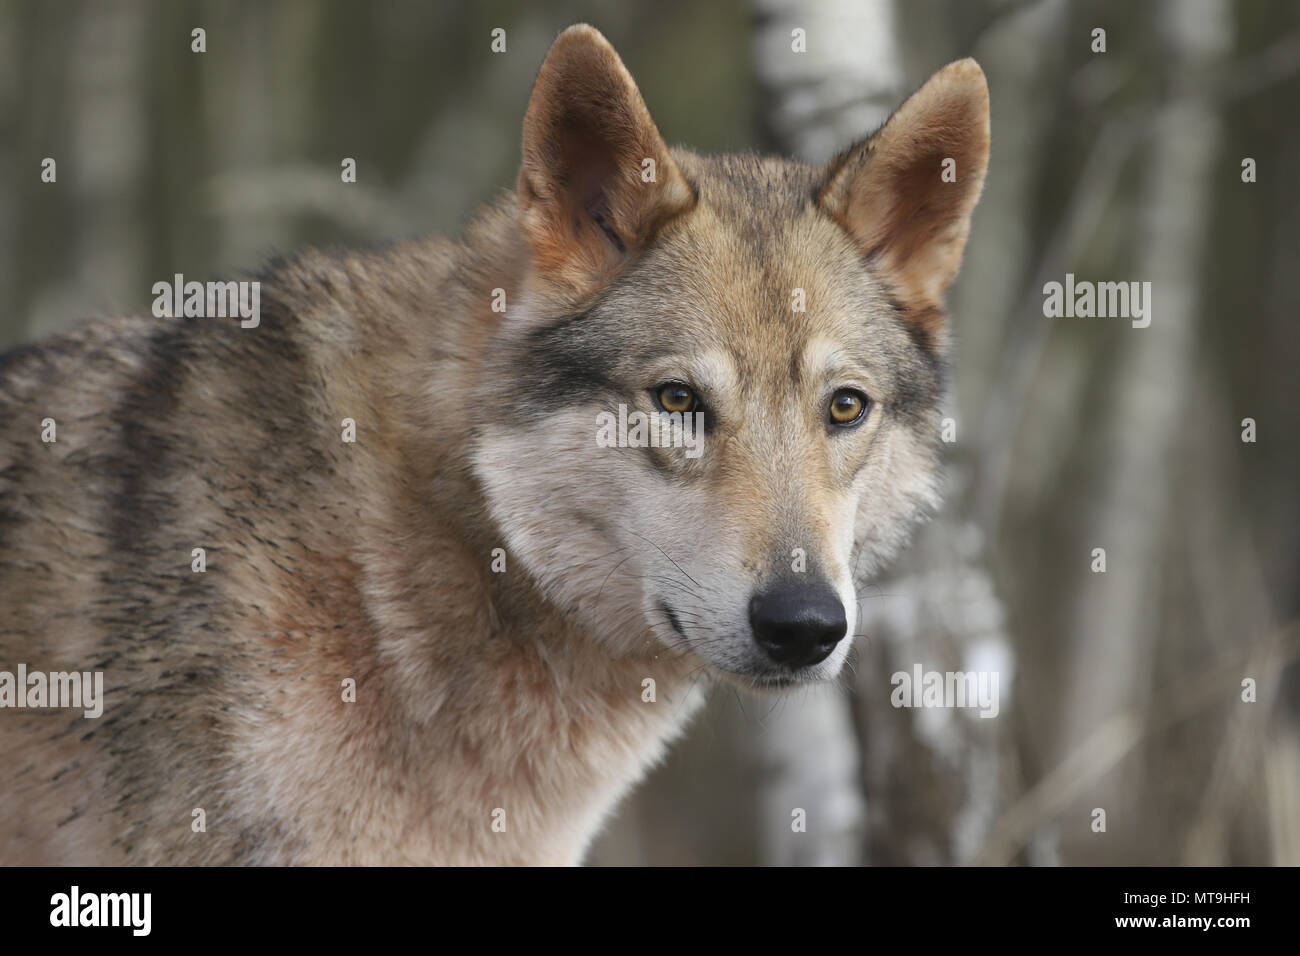 Czechoslovakian Wolfdog. Portrait of adult dog. Germany - Stock Image